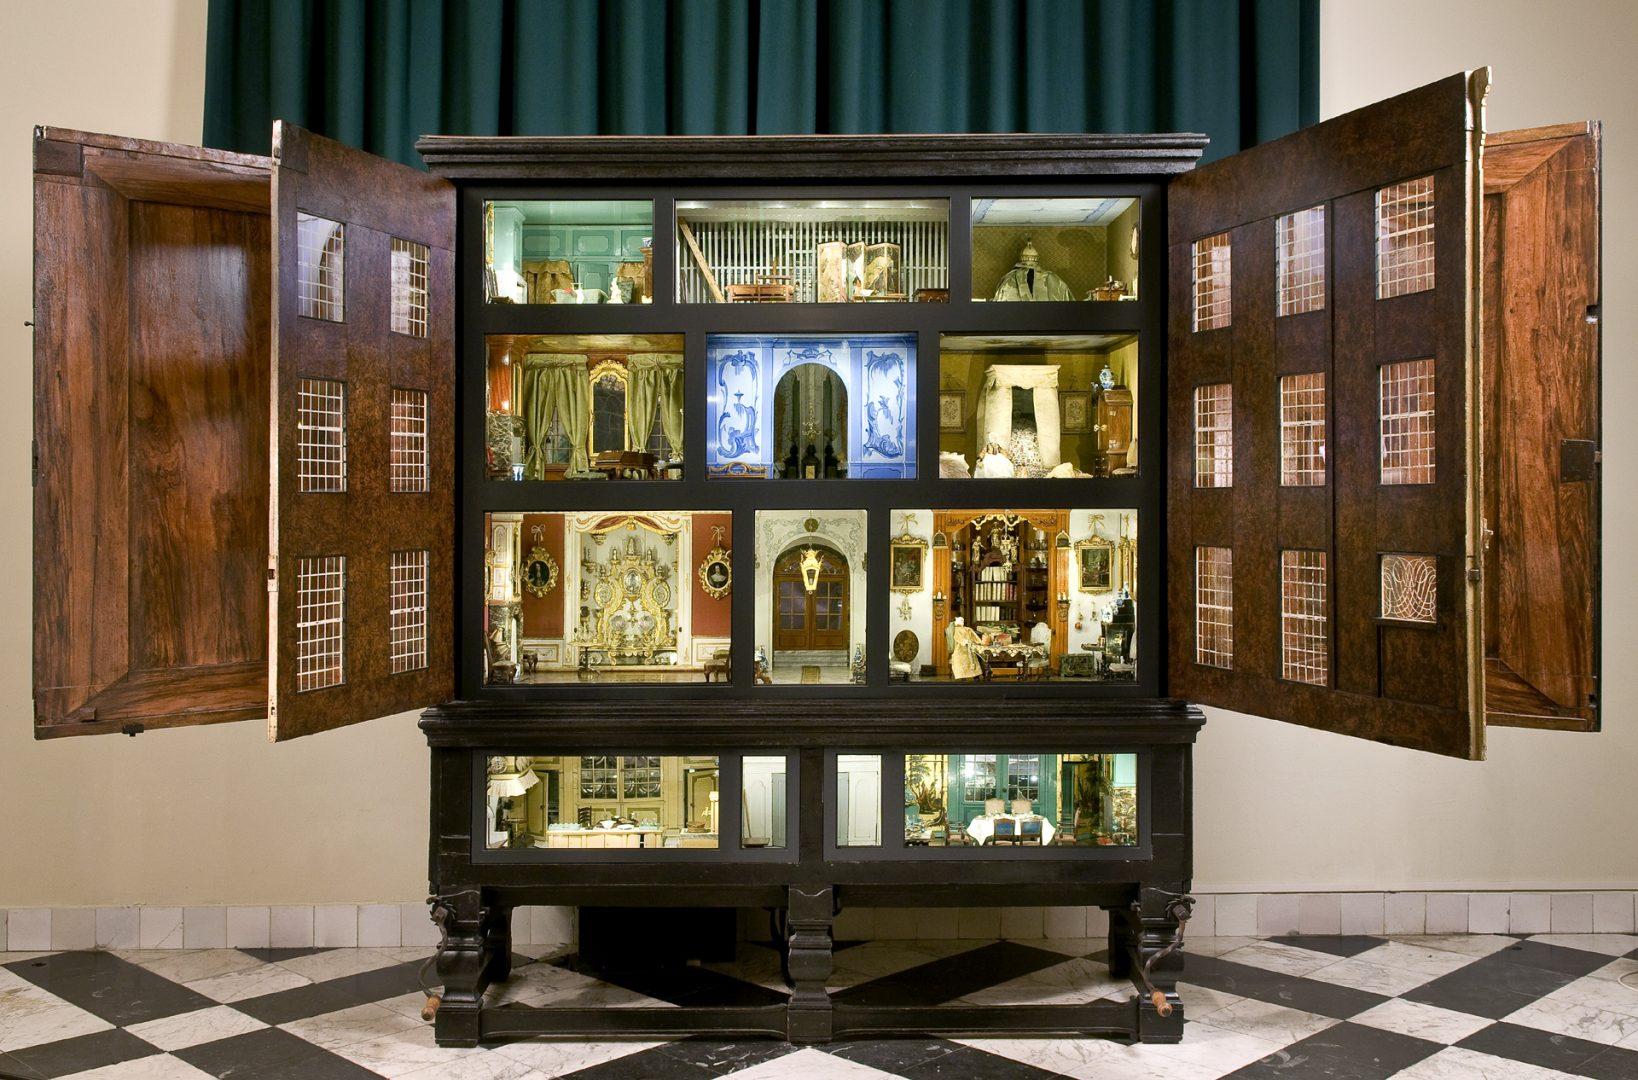 Frans Hals Museum, Haarlem, Netherlands